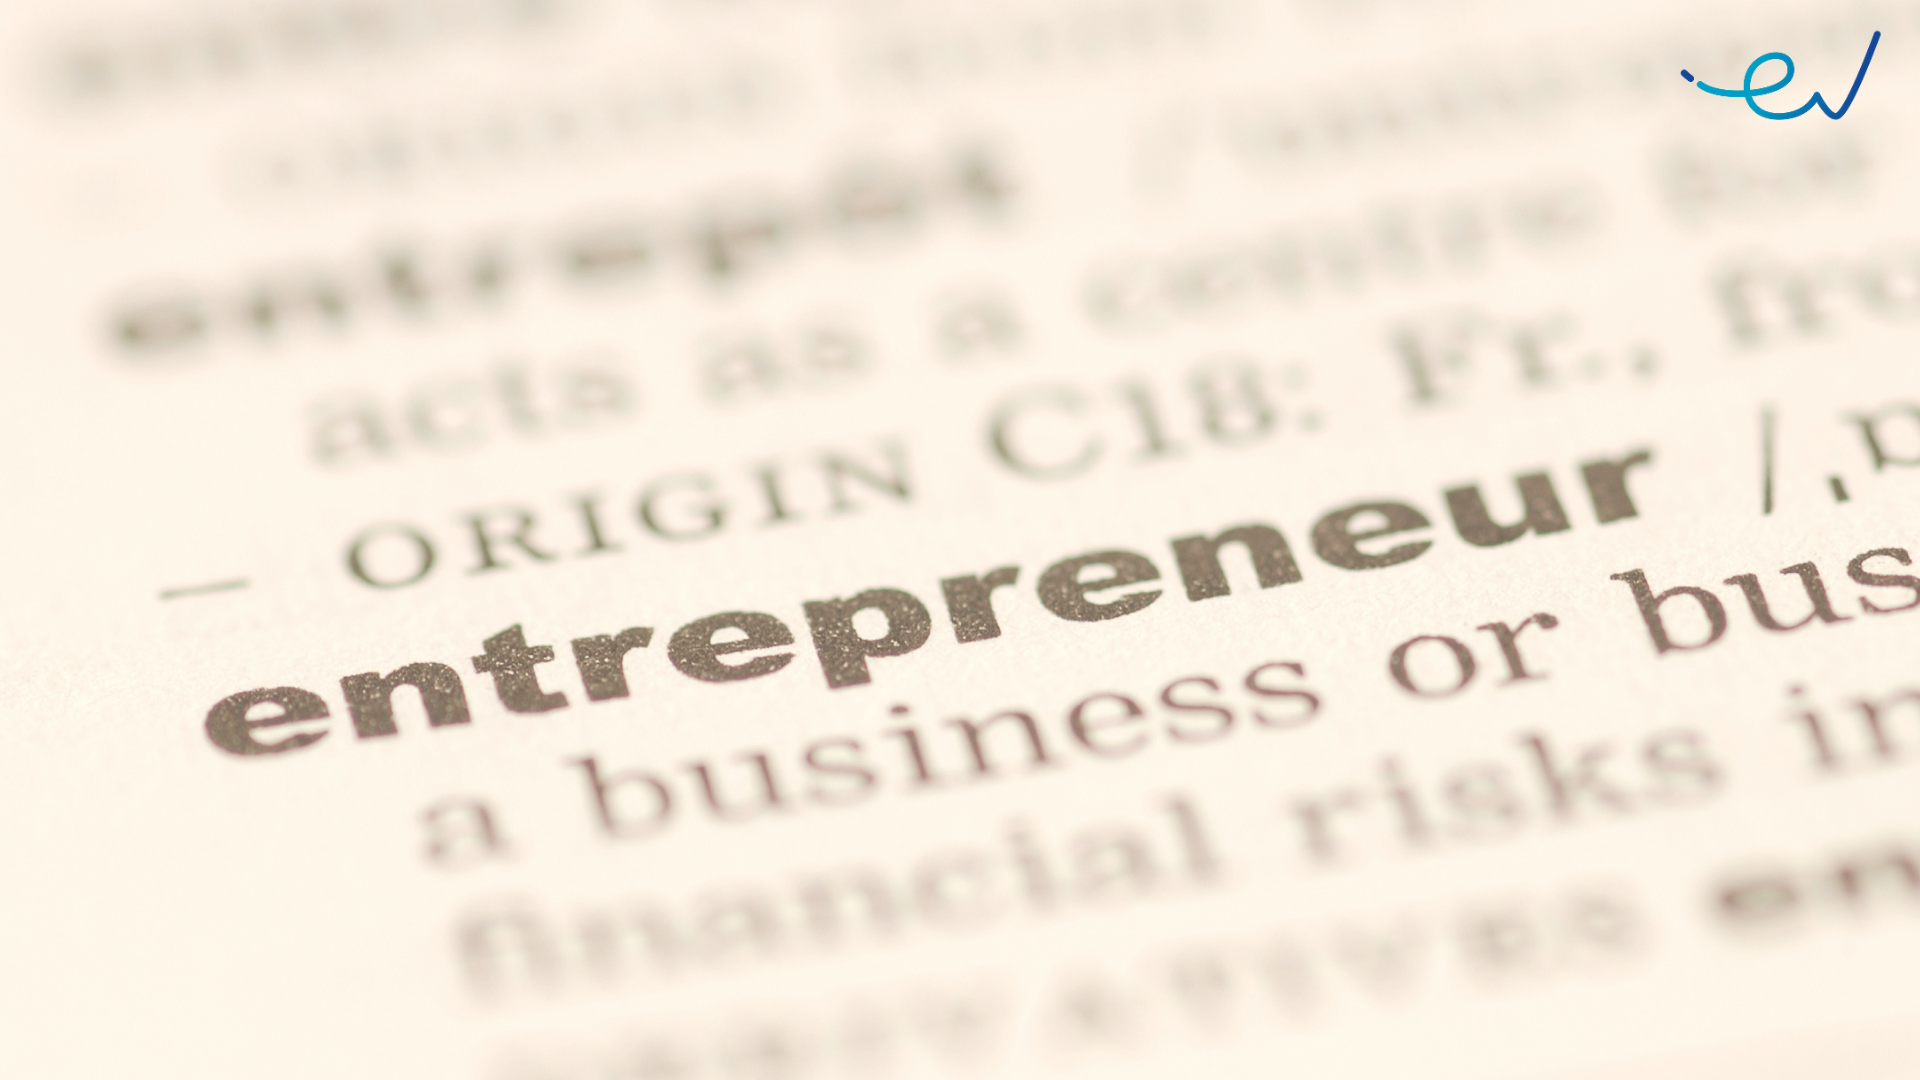 Crisis or no crisis, entrepreneurship persists